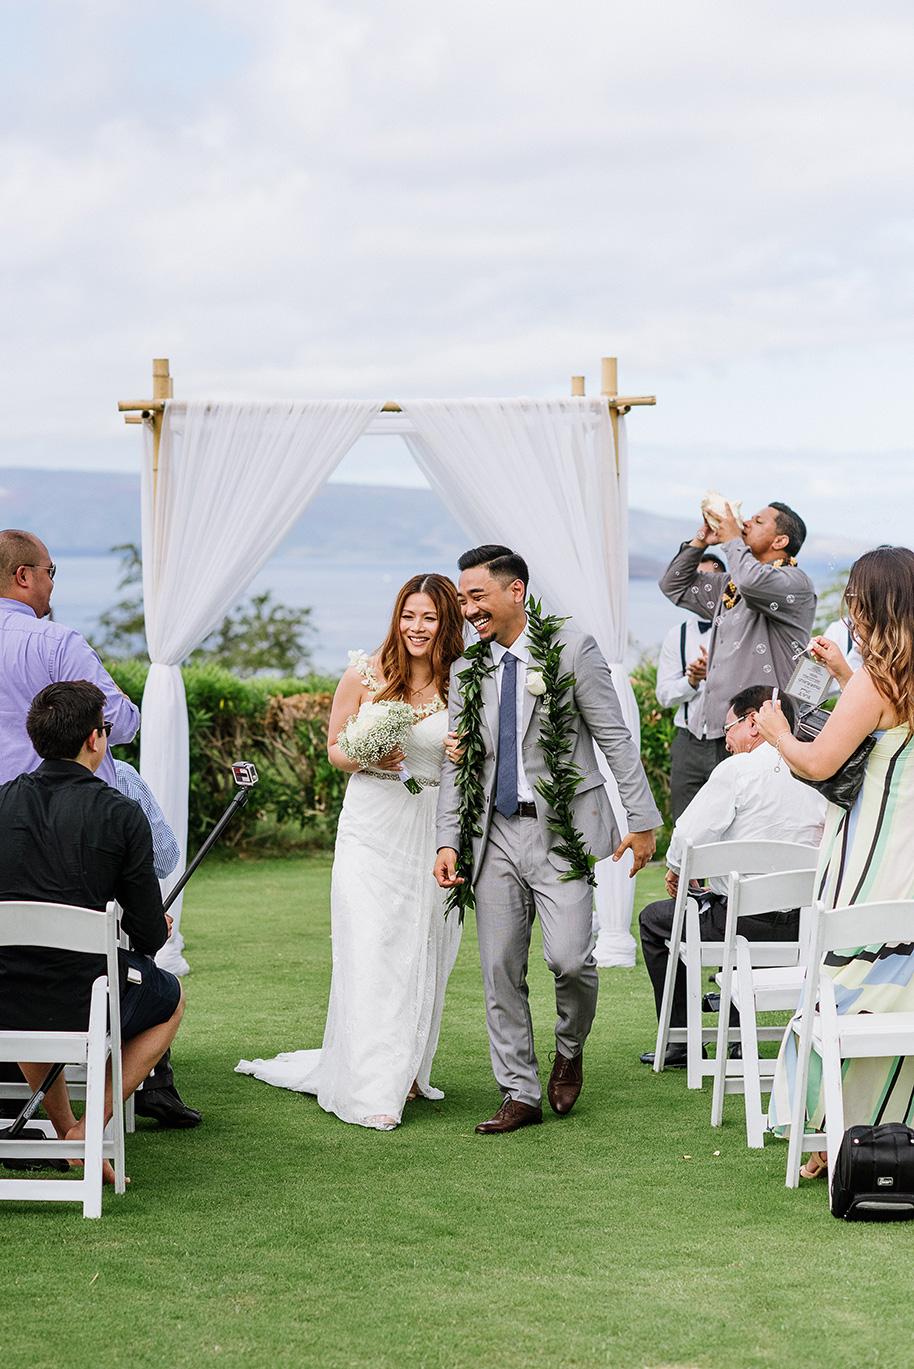 Maui-Wedding-052416-18